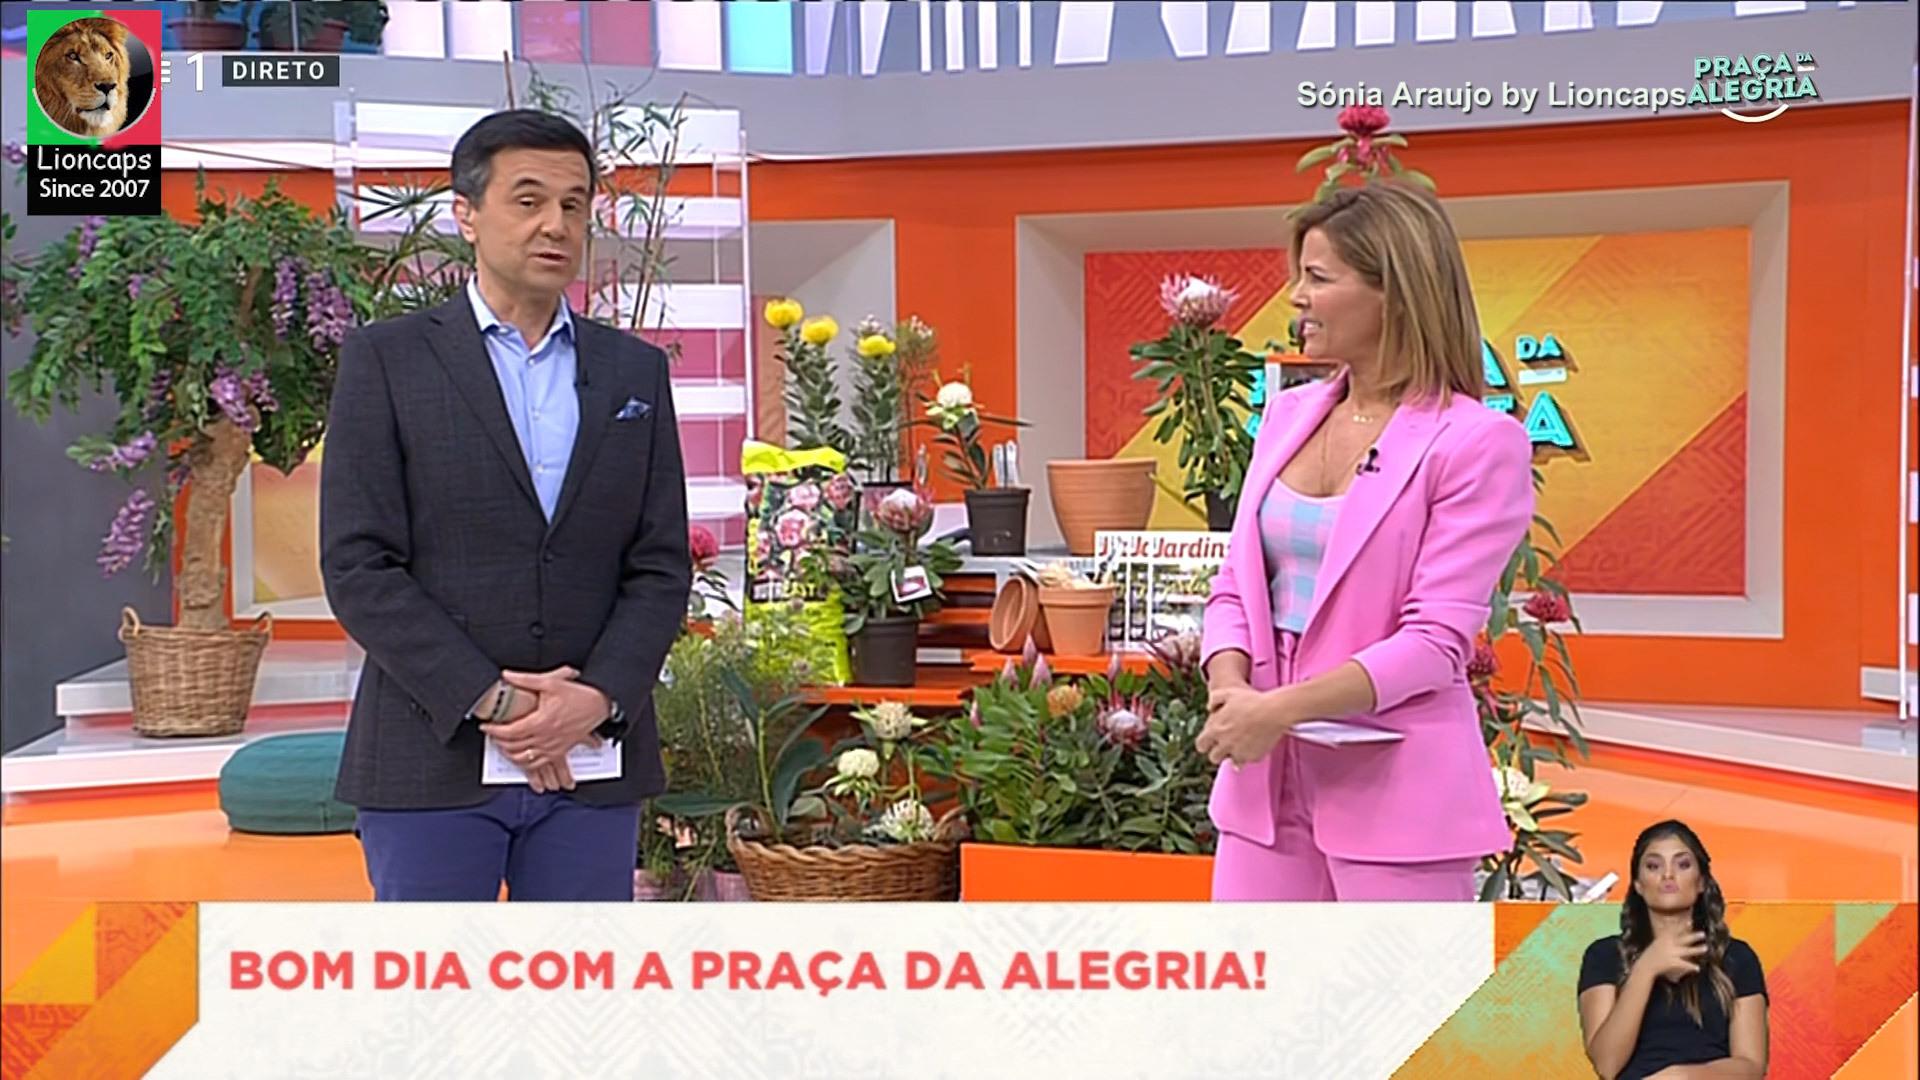 sonia_araujo_praca_lioncaps_11_04_2021 (11).jpg